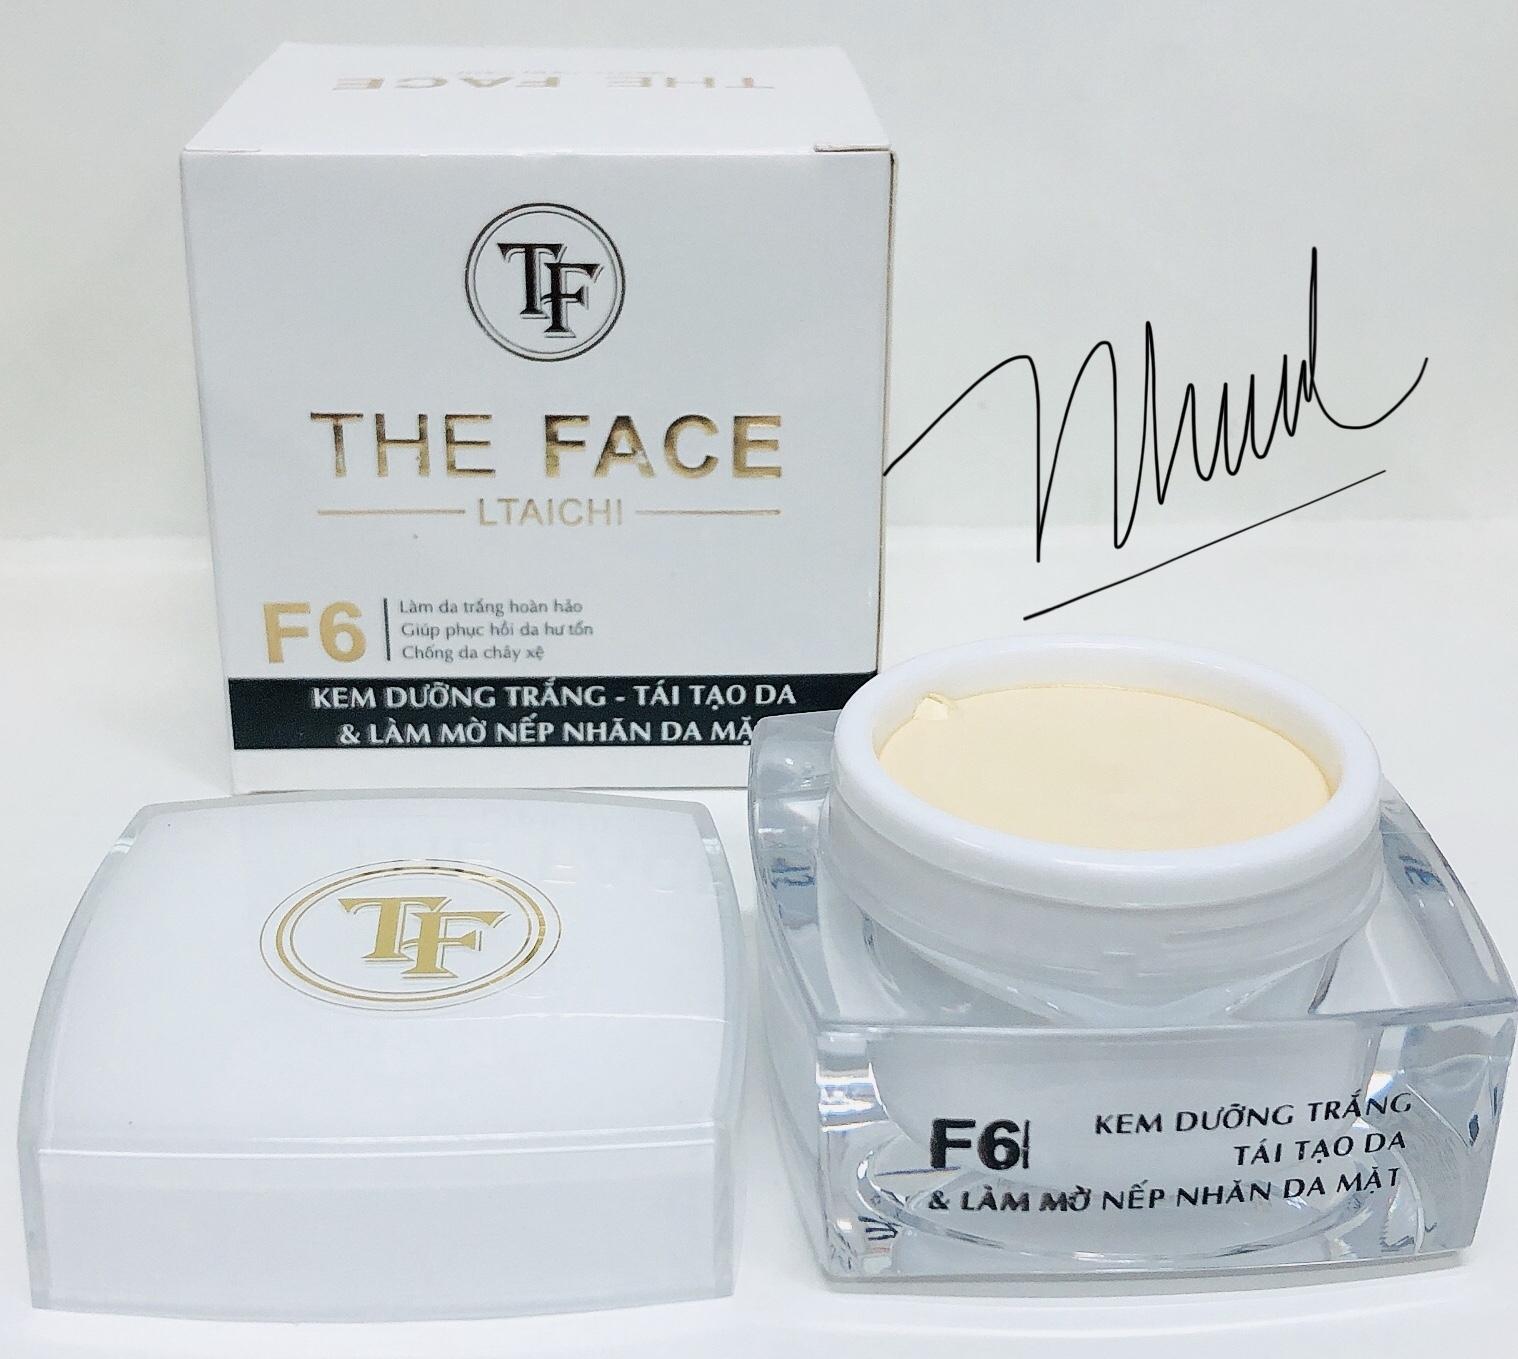 Kem Dưỡng Trắng Da Tái Tạo Da Làm Mờ Nếp Nhăn Da Mặt The Face F6 Loại 25g